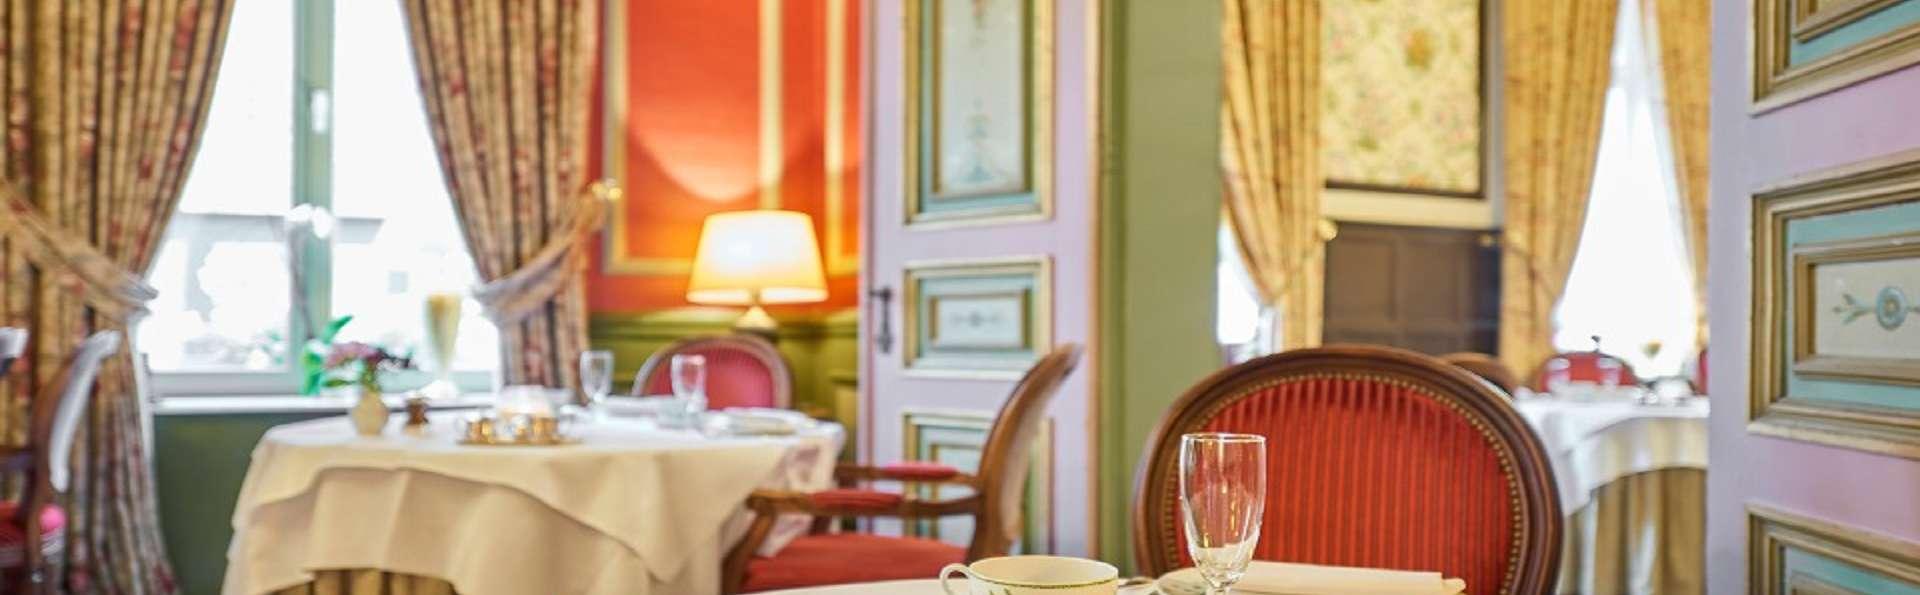 Relais & Châteaux Hotel Heritage - R_C_Hotel_Heritage_-_Breakfast_room_-__LaurusDesign.jpg